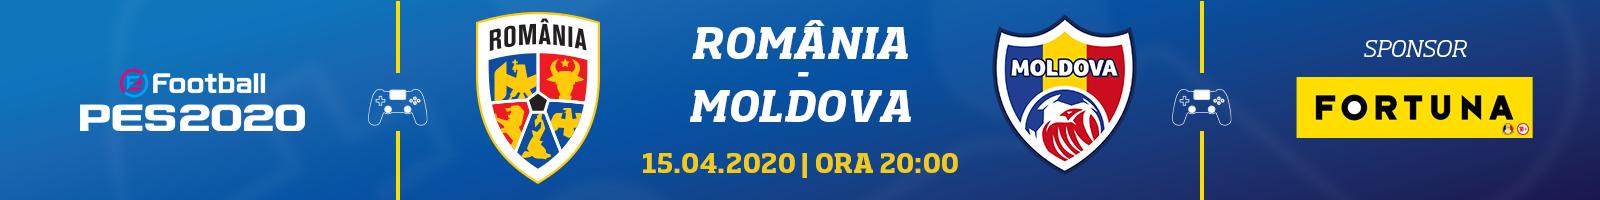 https://www.bilete.ro/media/22216/fortuna-simplu.png?